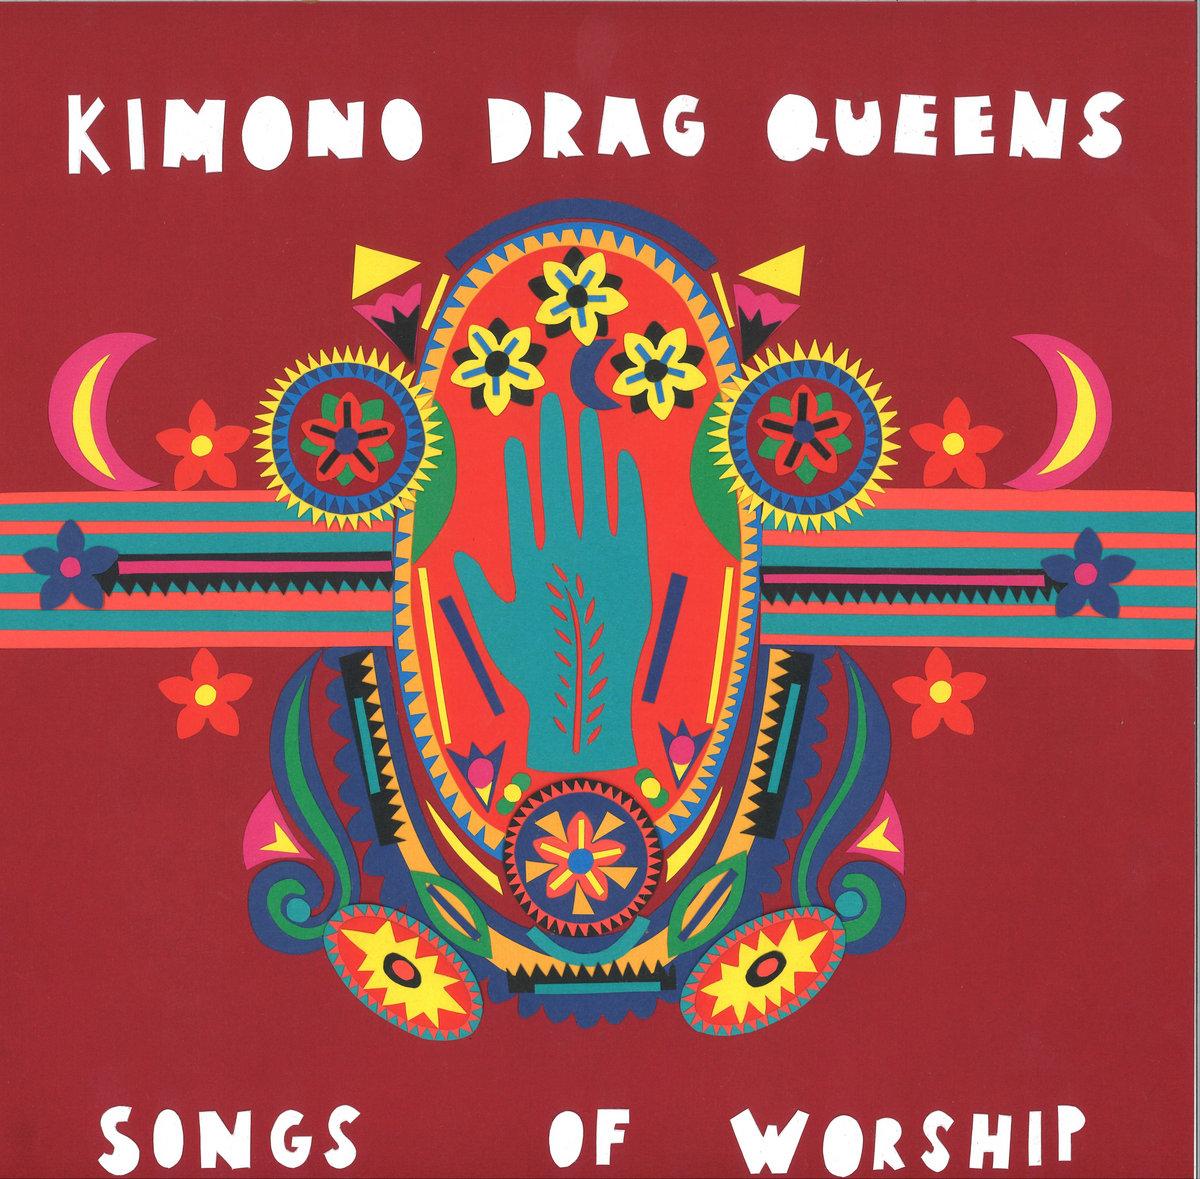 Kimono Drag Queens - Songs of Worship